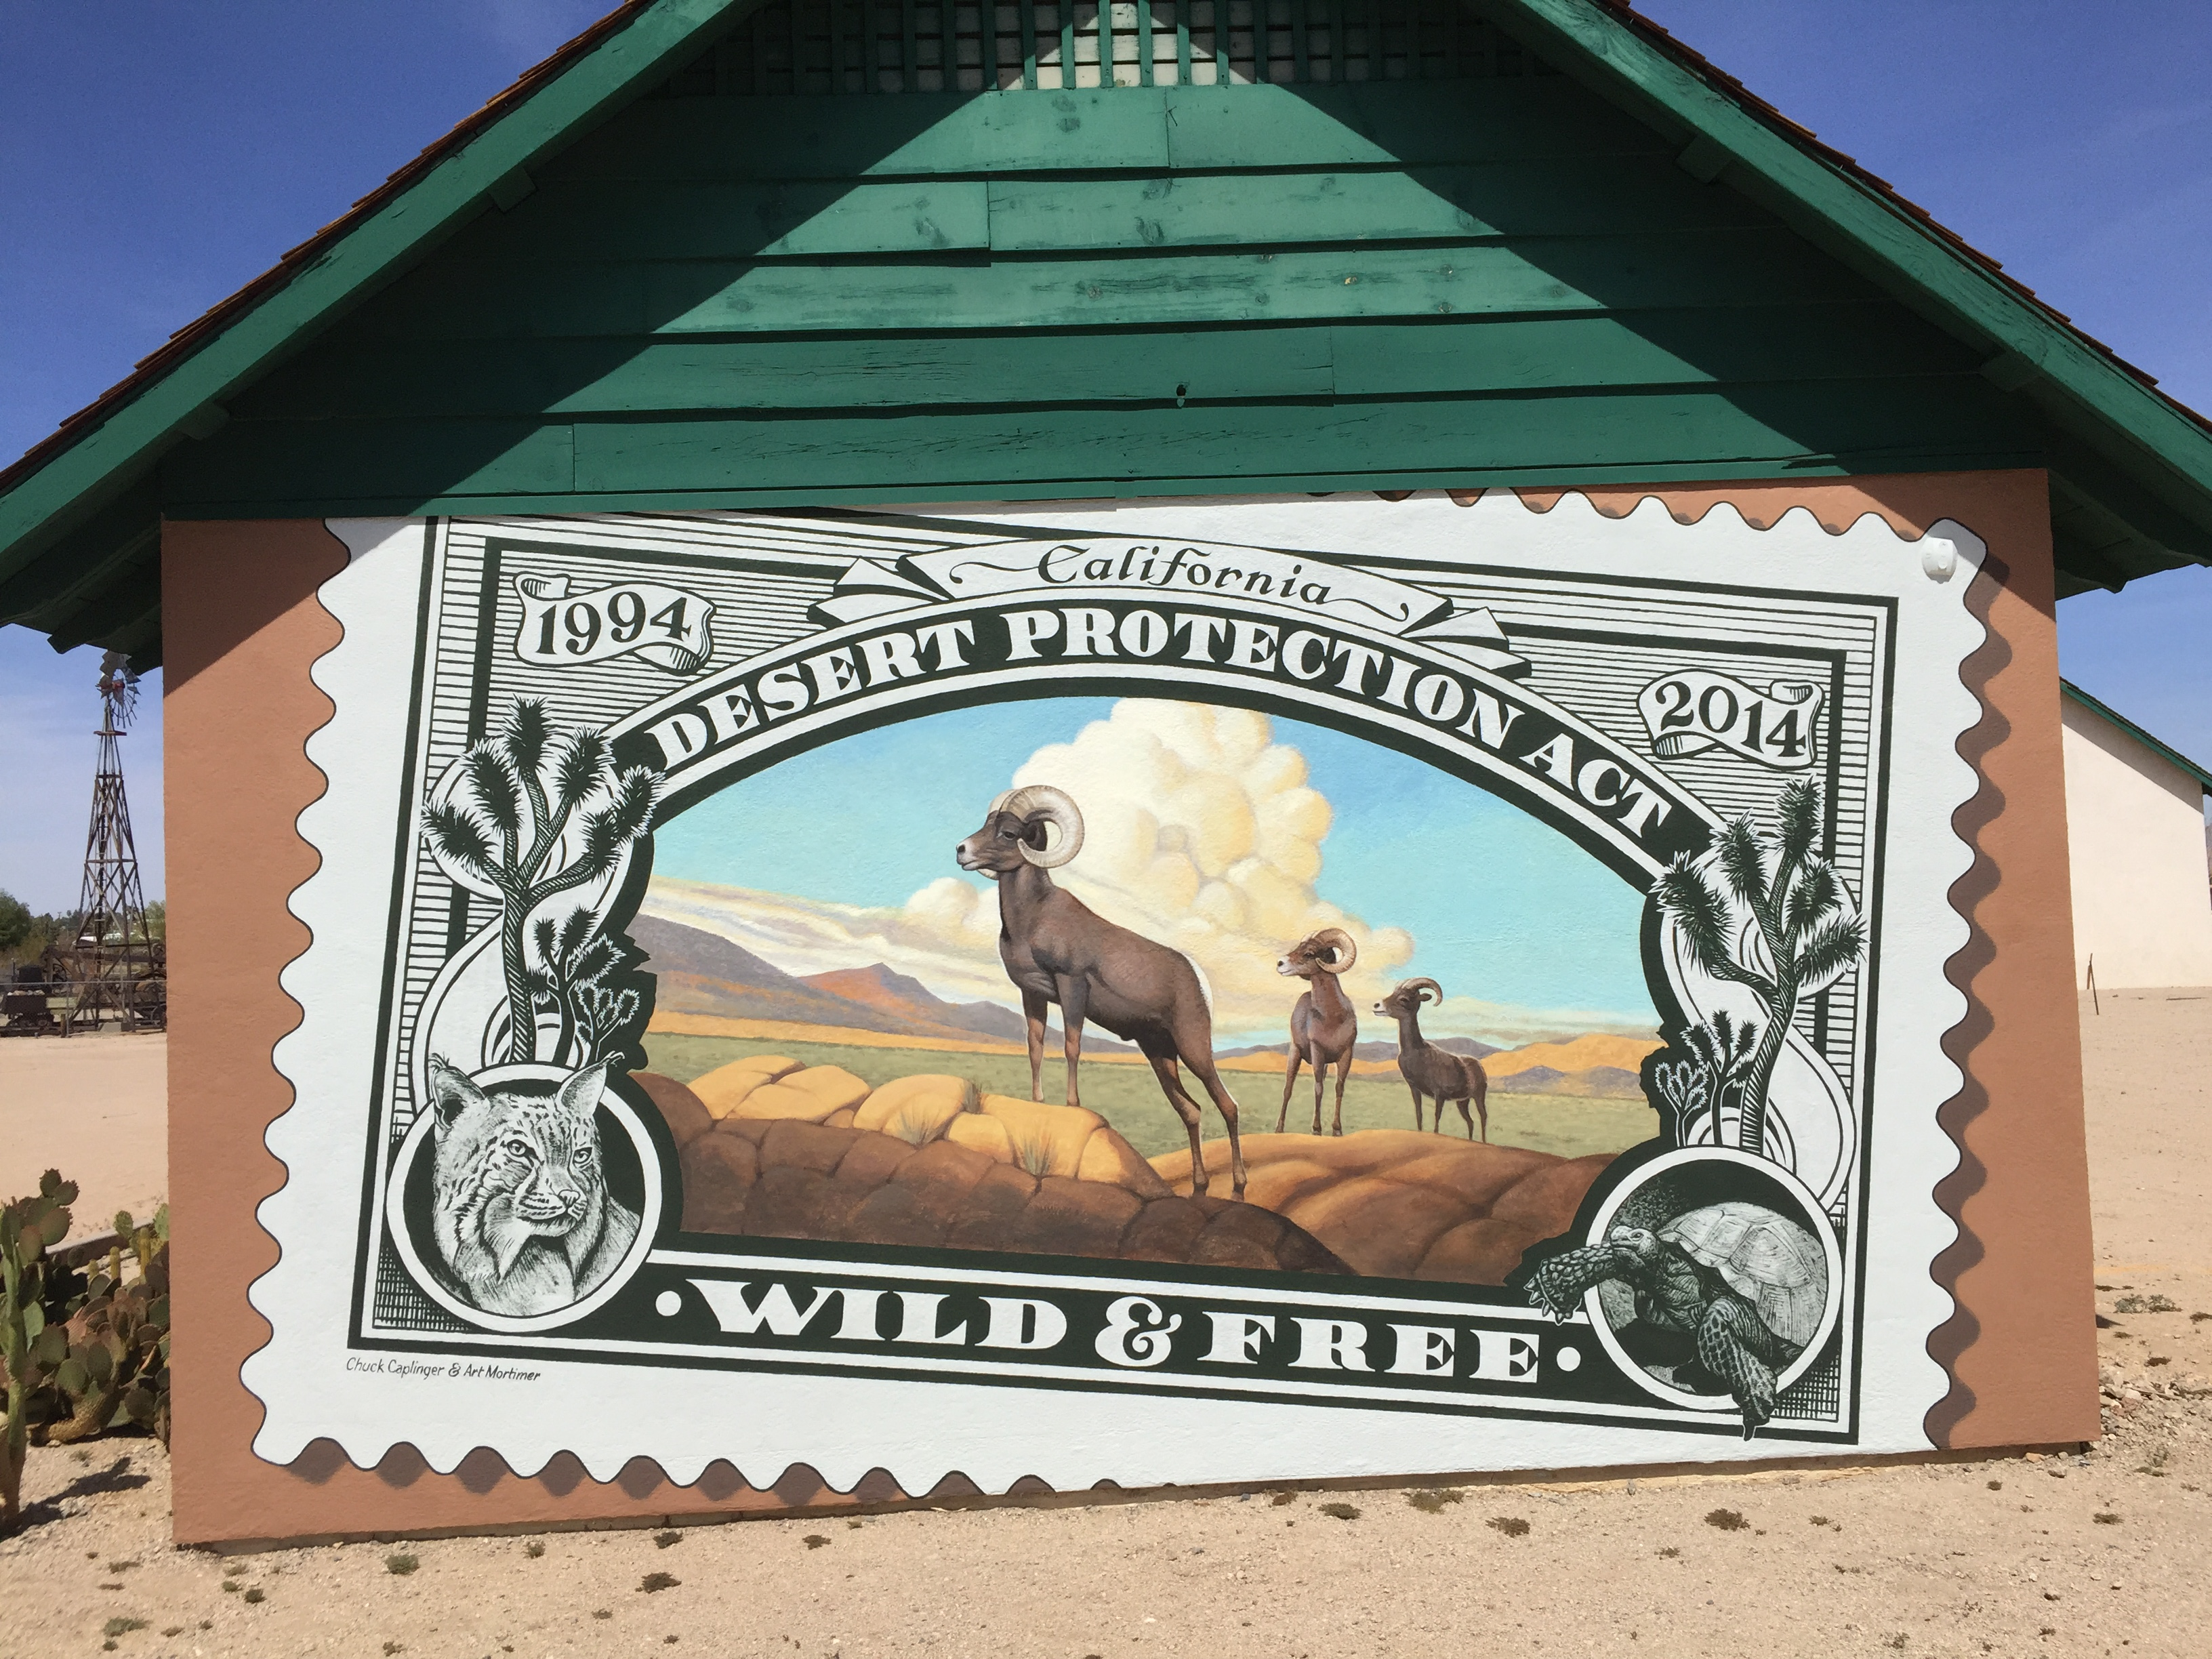 29 Palms schoolhouse mural